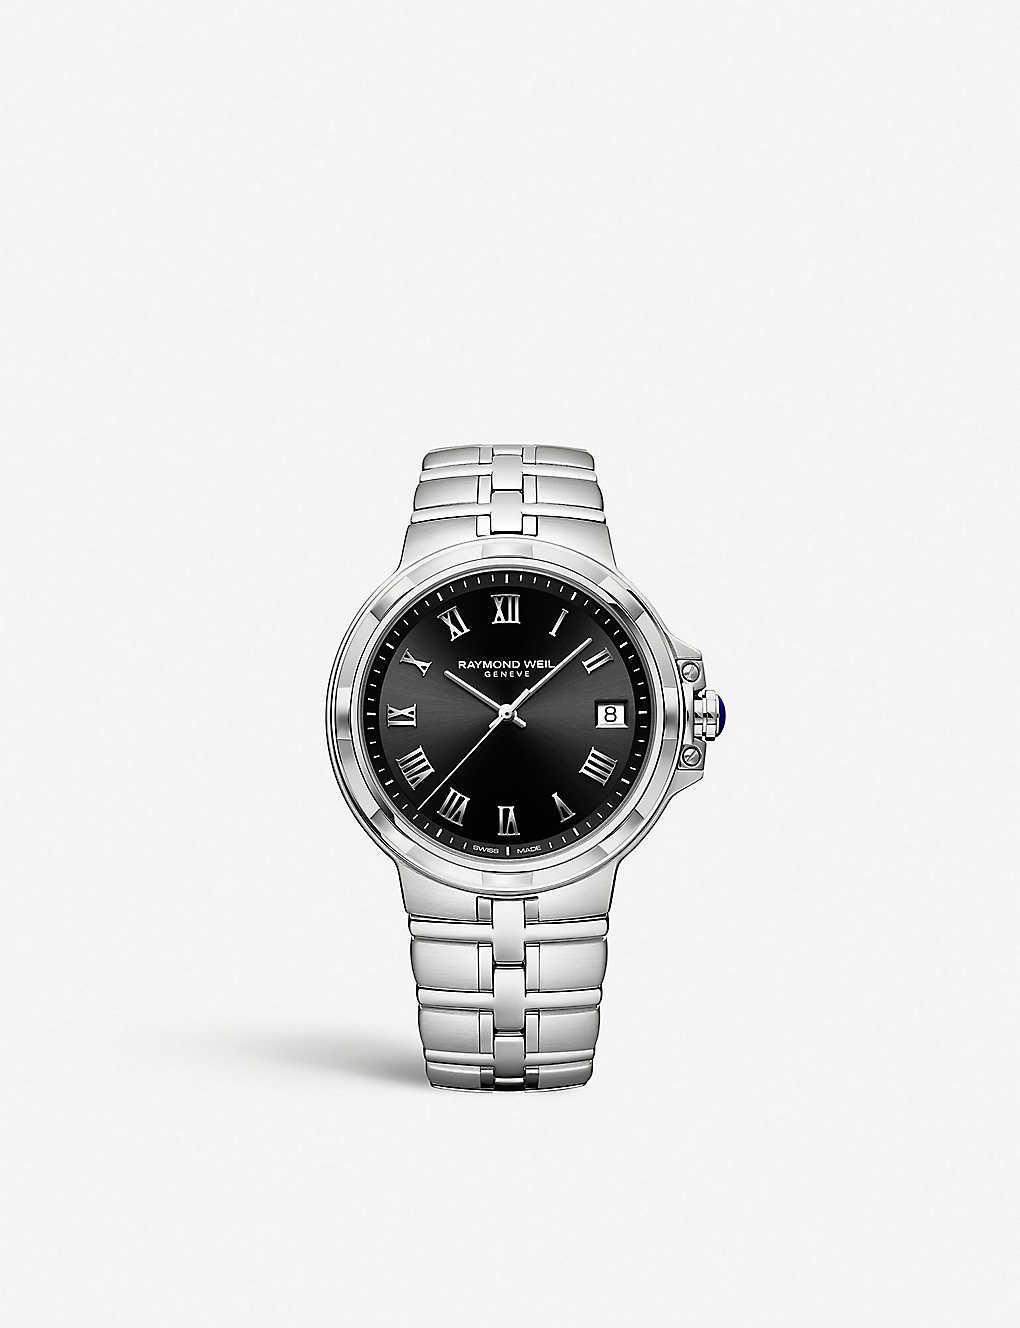 Raymond Weil 5580 St 00208 Parsifal Stainless Steel Quartz Watch